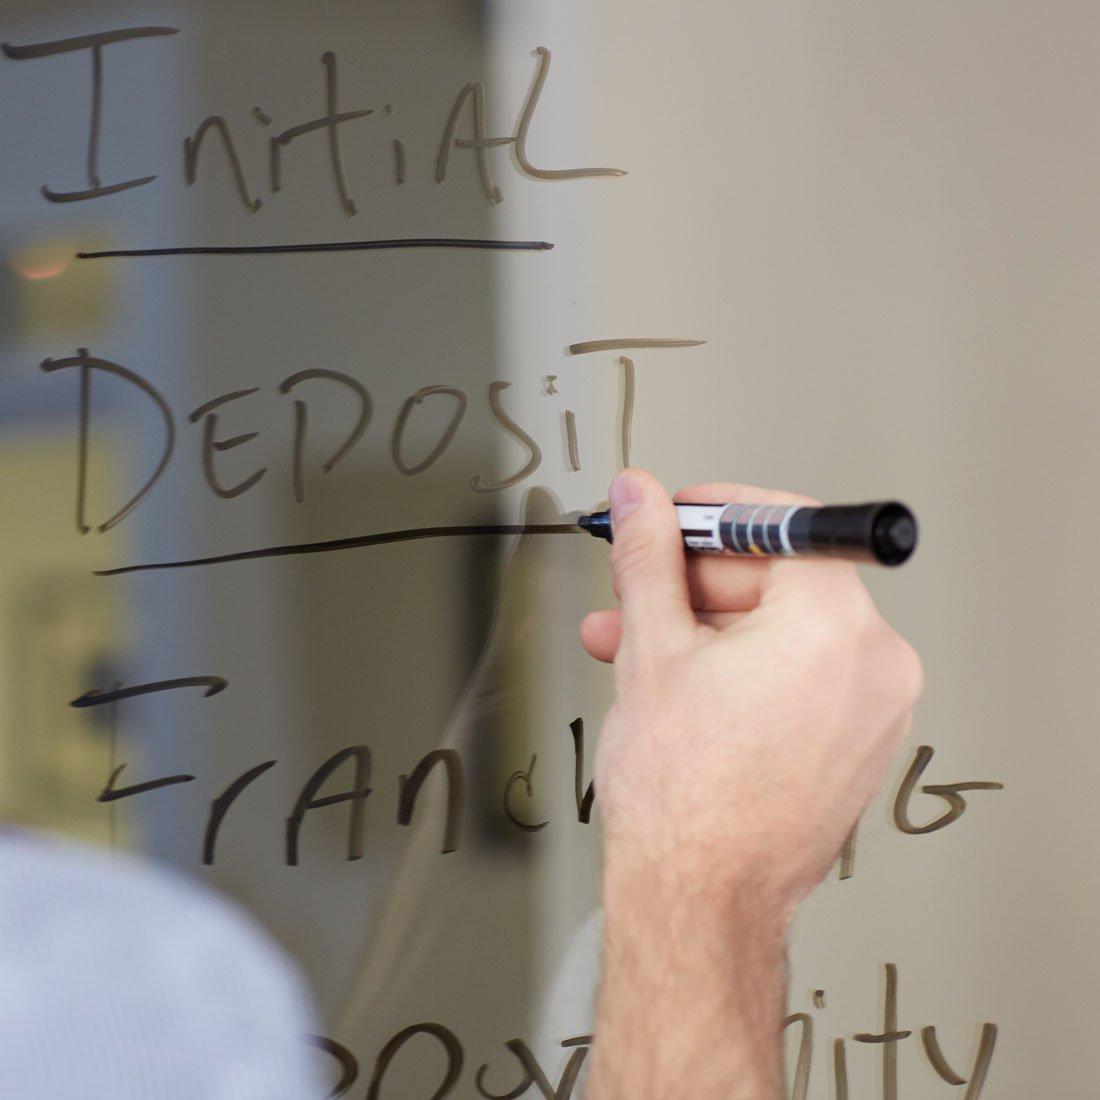 steps-written-on-mirror-in-black-ink-indicator-expo-marker.jpg